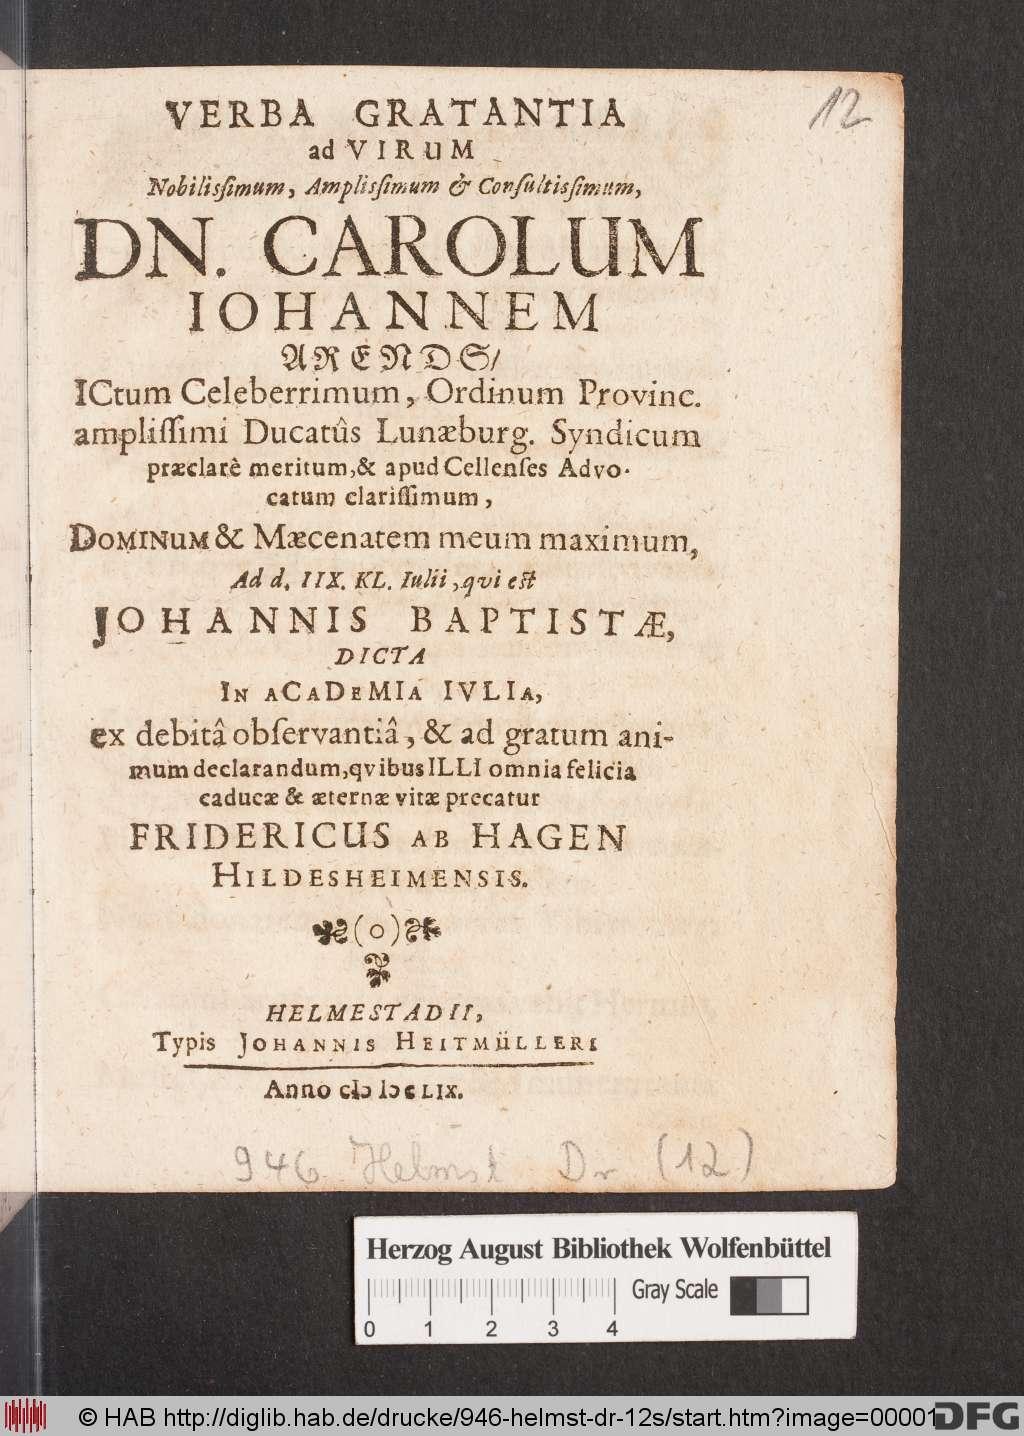 http://diglib.hab.de/drucke/946-helmst-dr-12s/00001.jpg